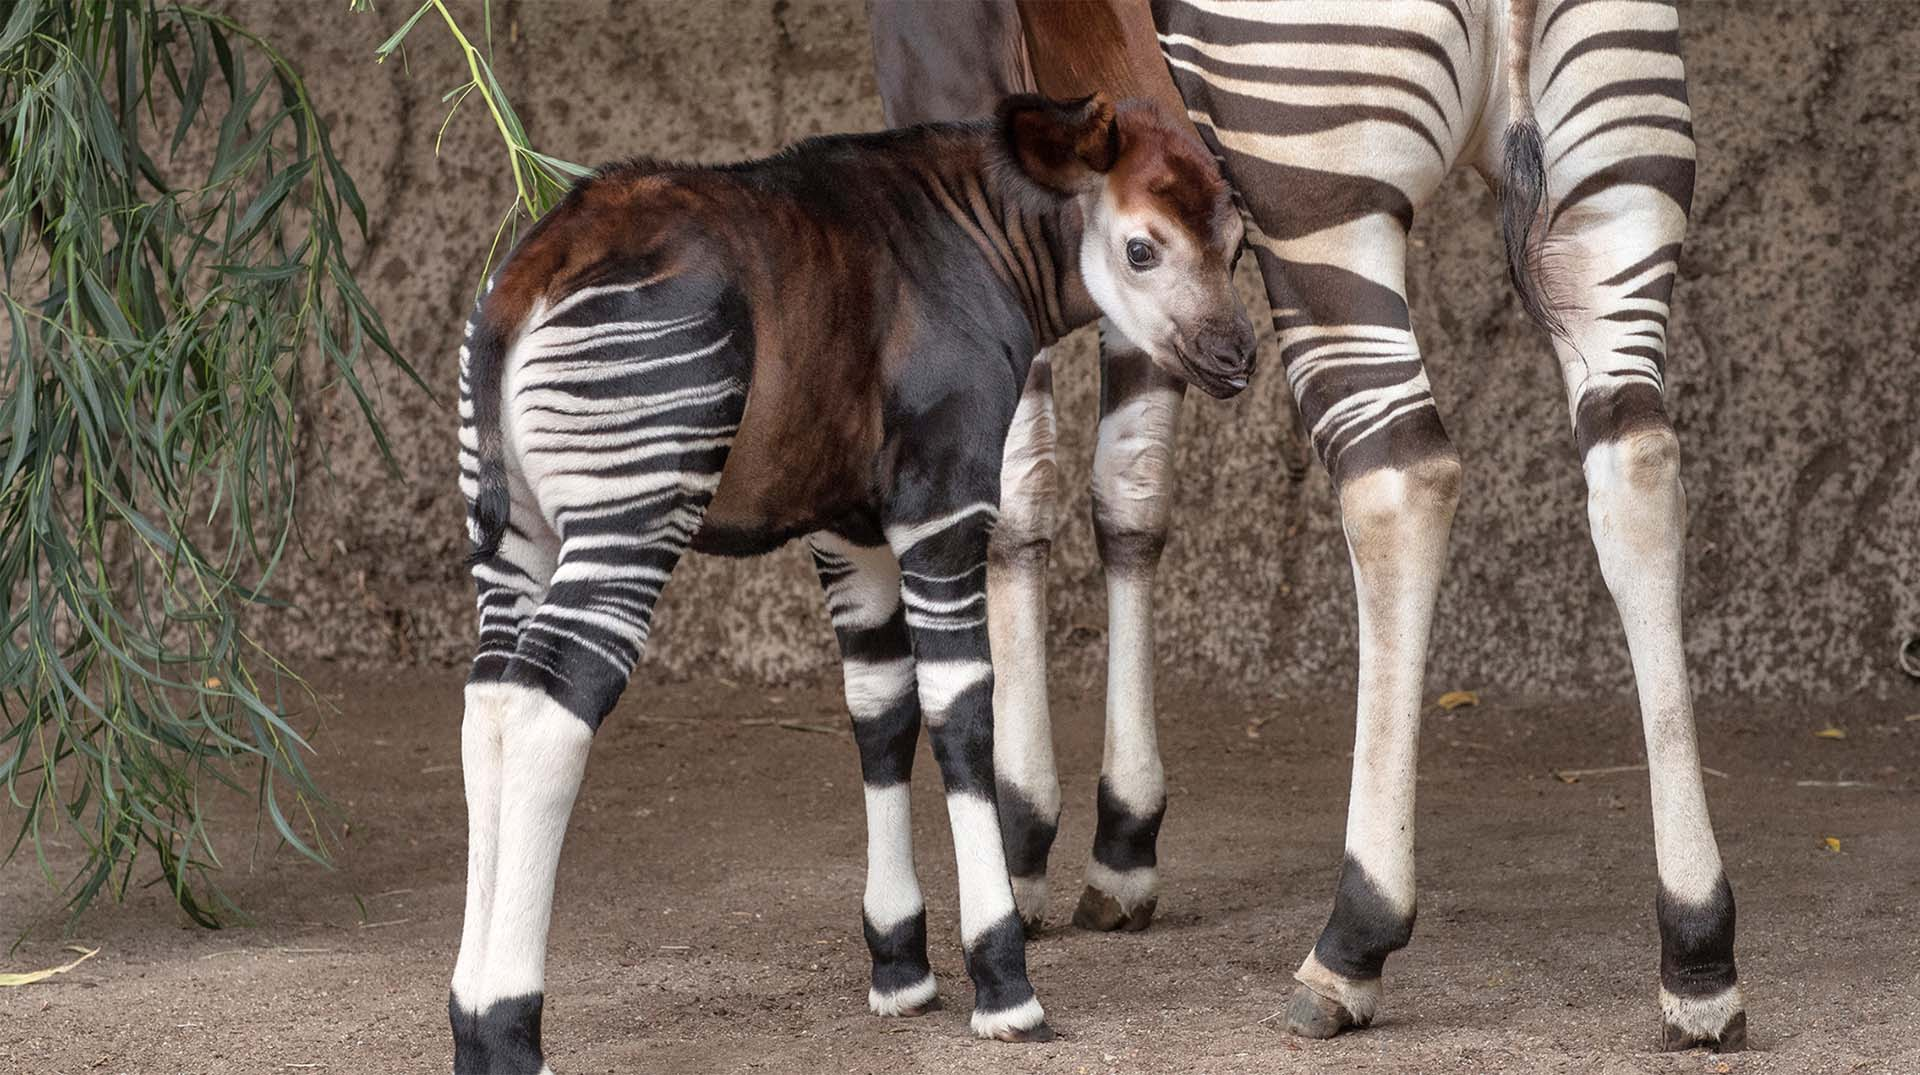 Okapi | San Diego Zoo Animals & Plants